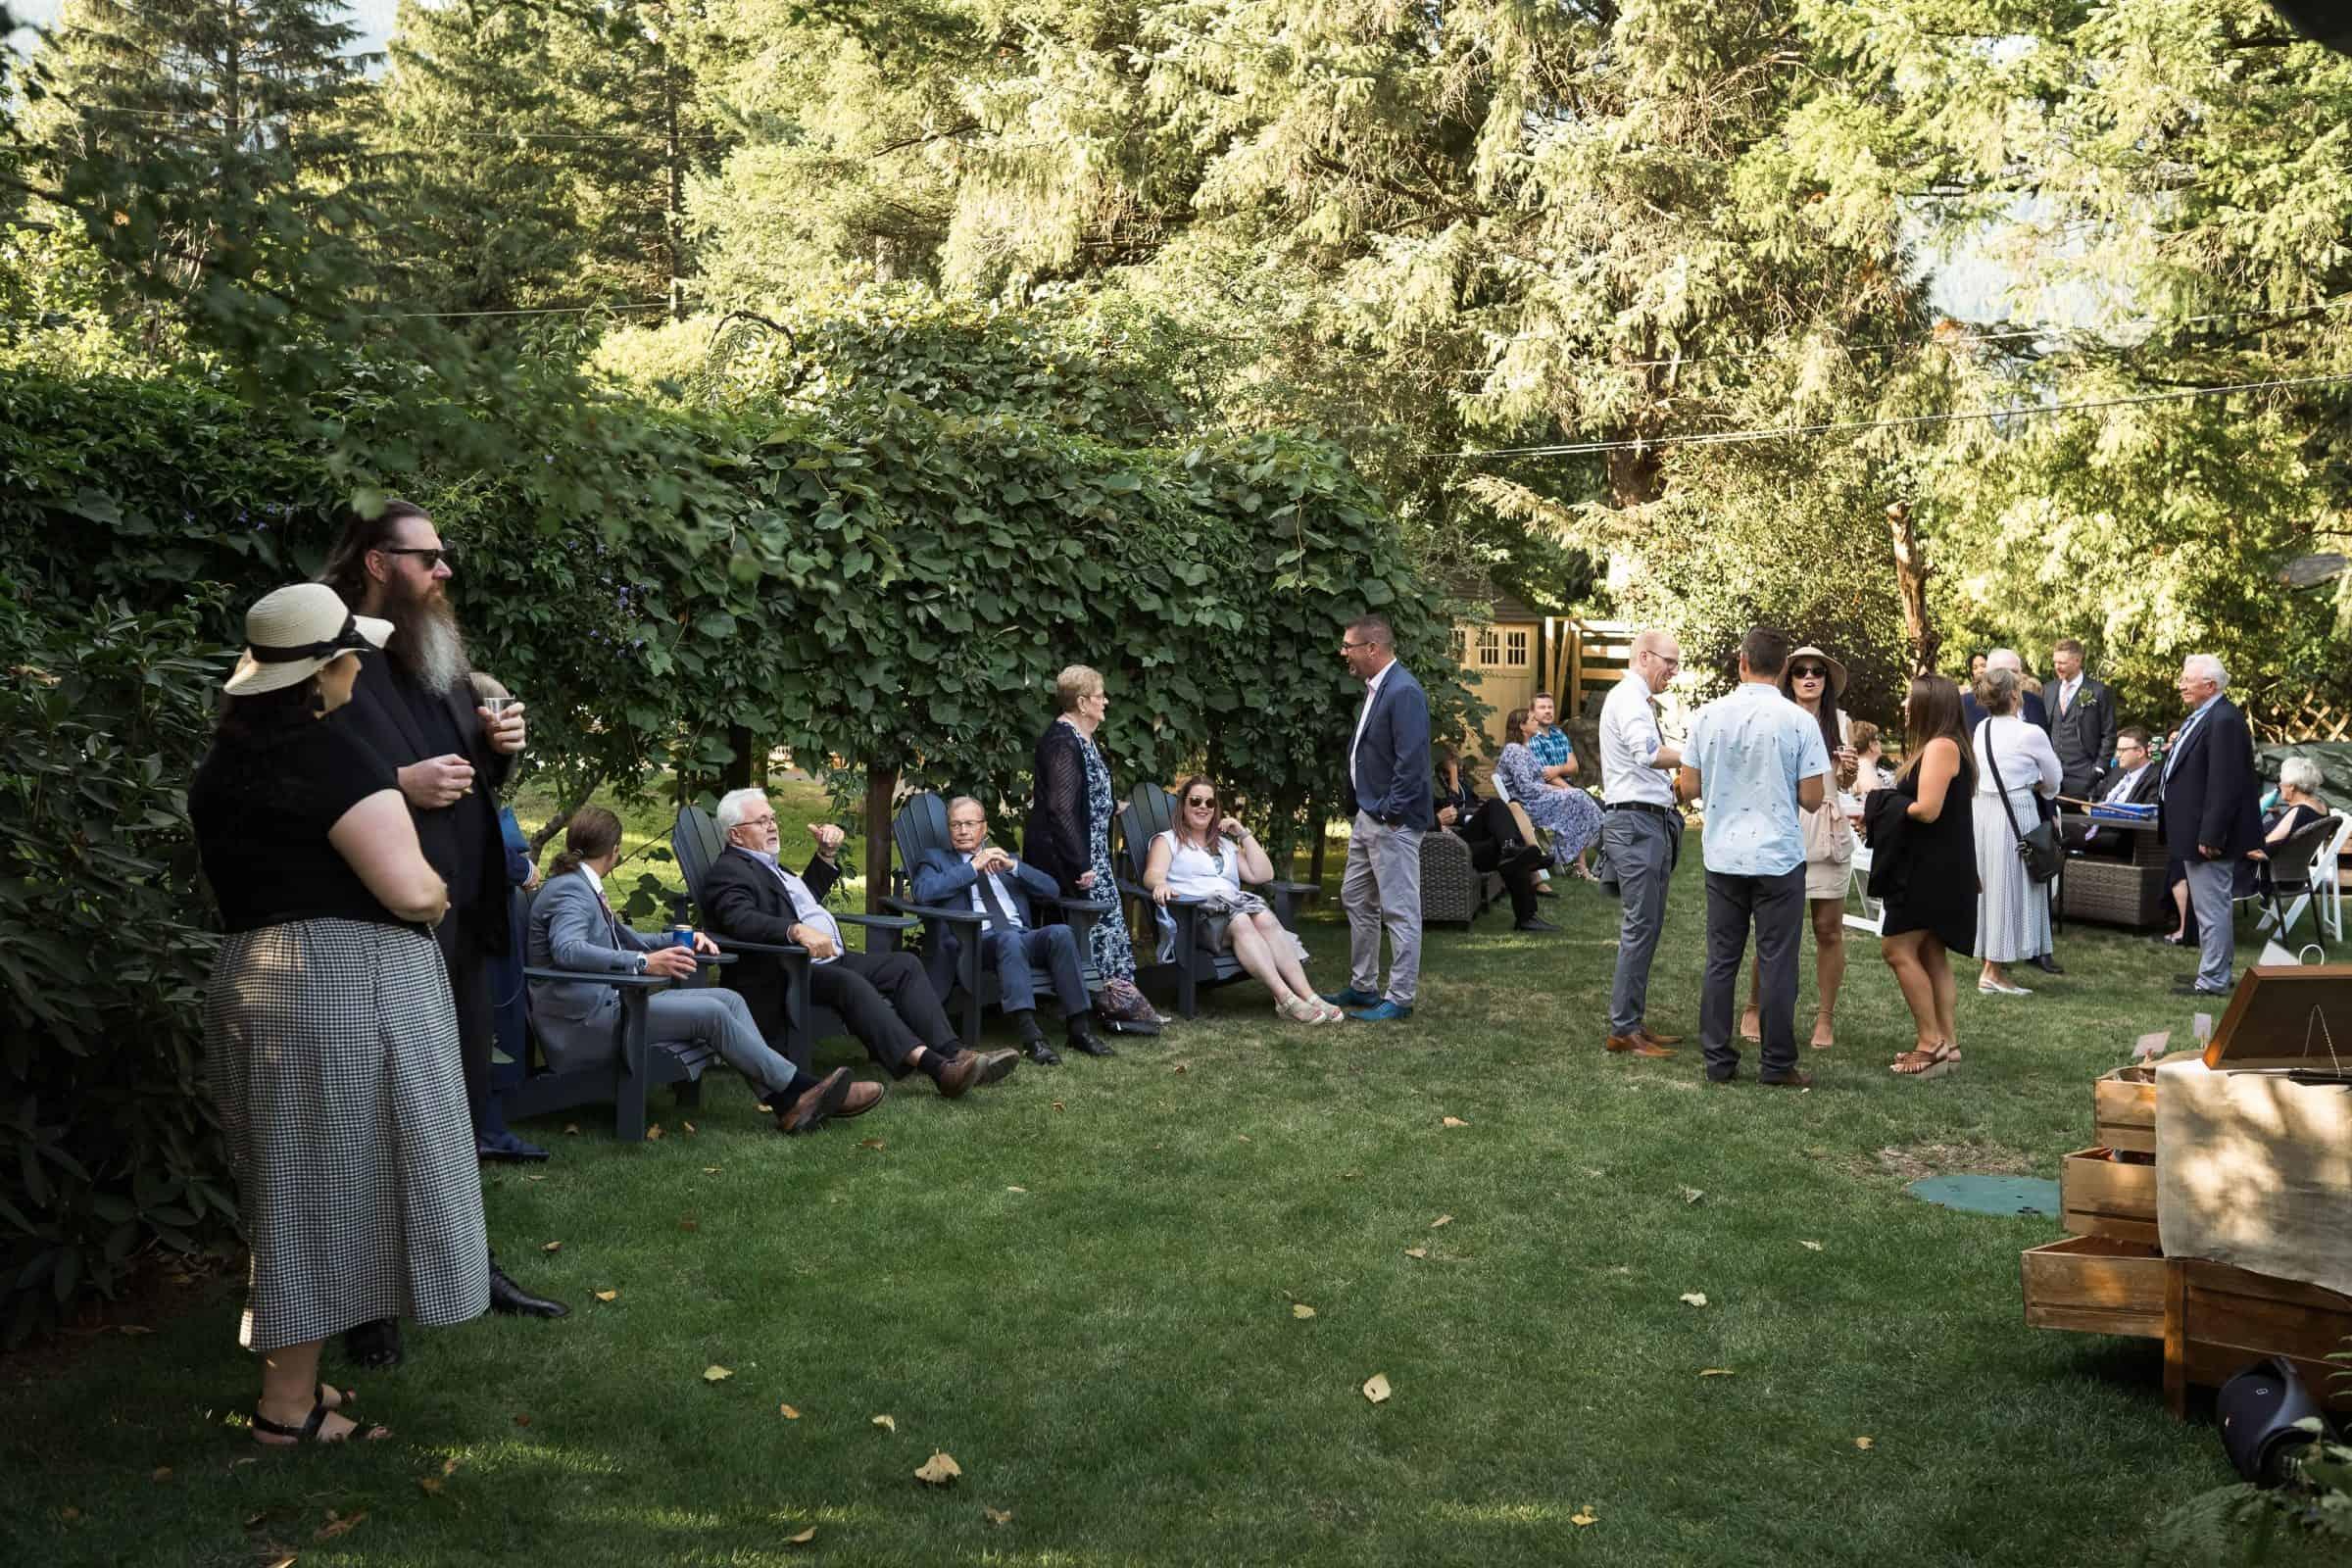 people mingling in backyard during wedding